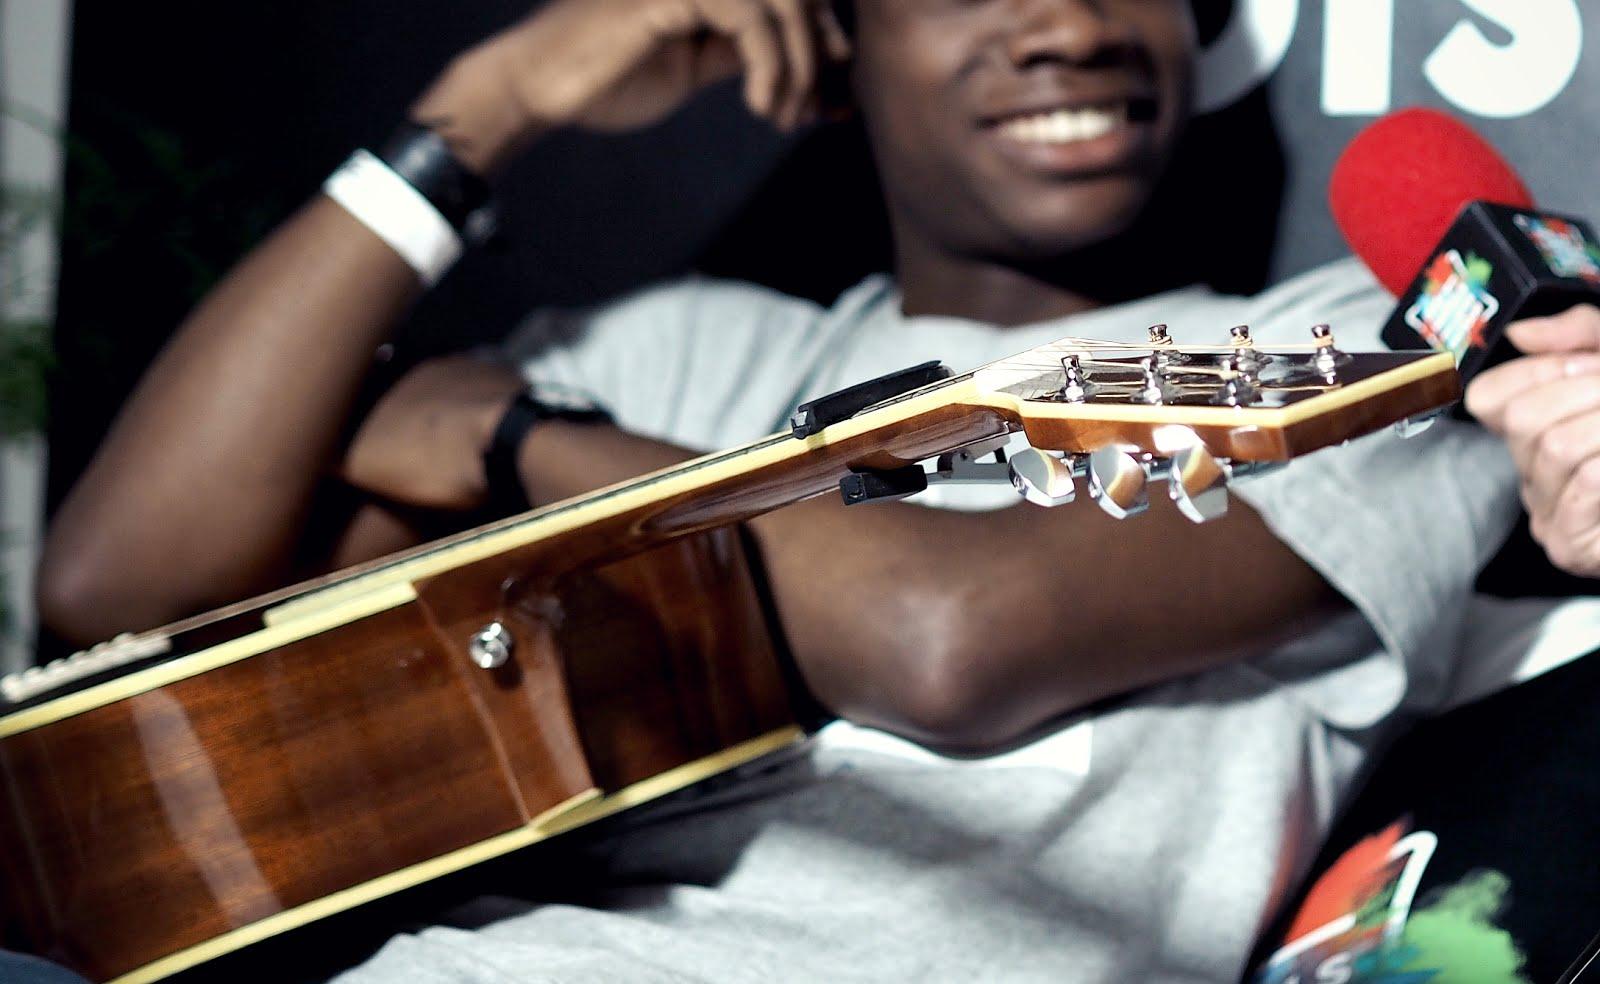 jay johnson guitar, ibis lates